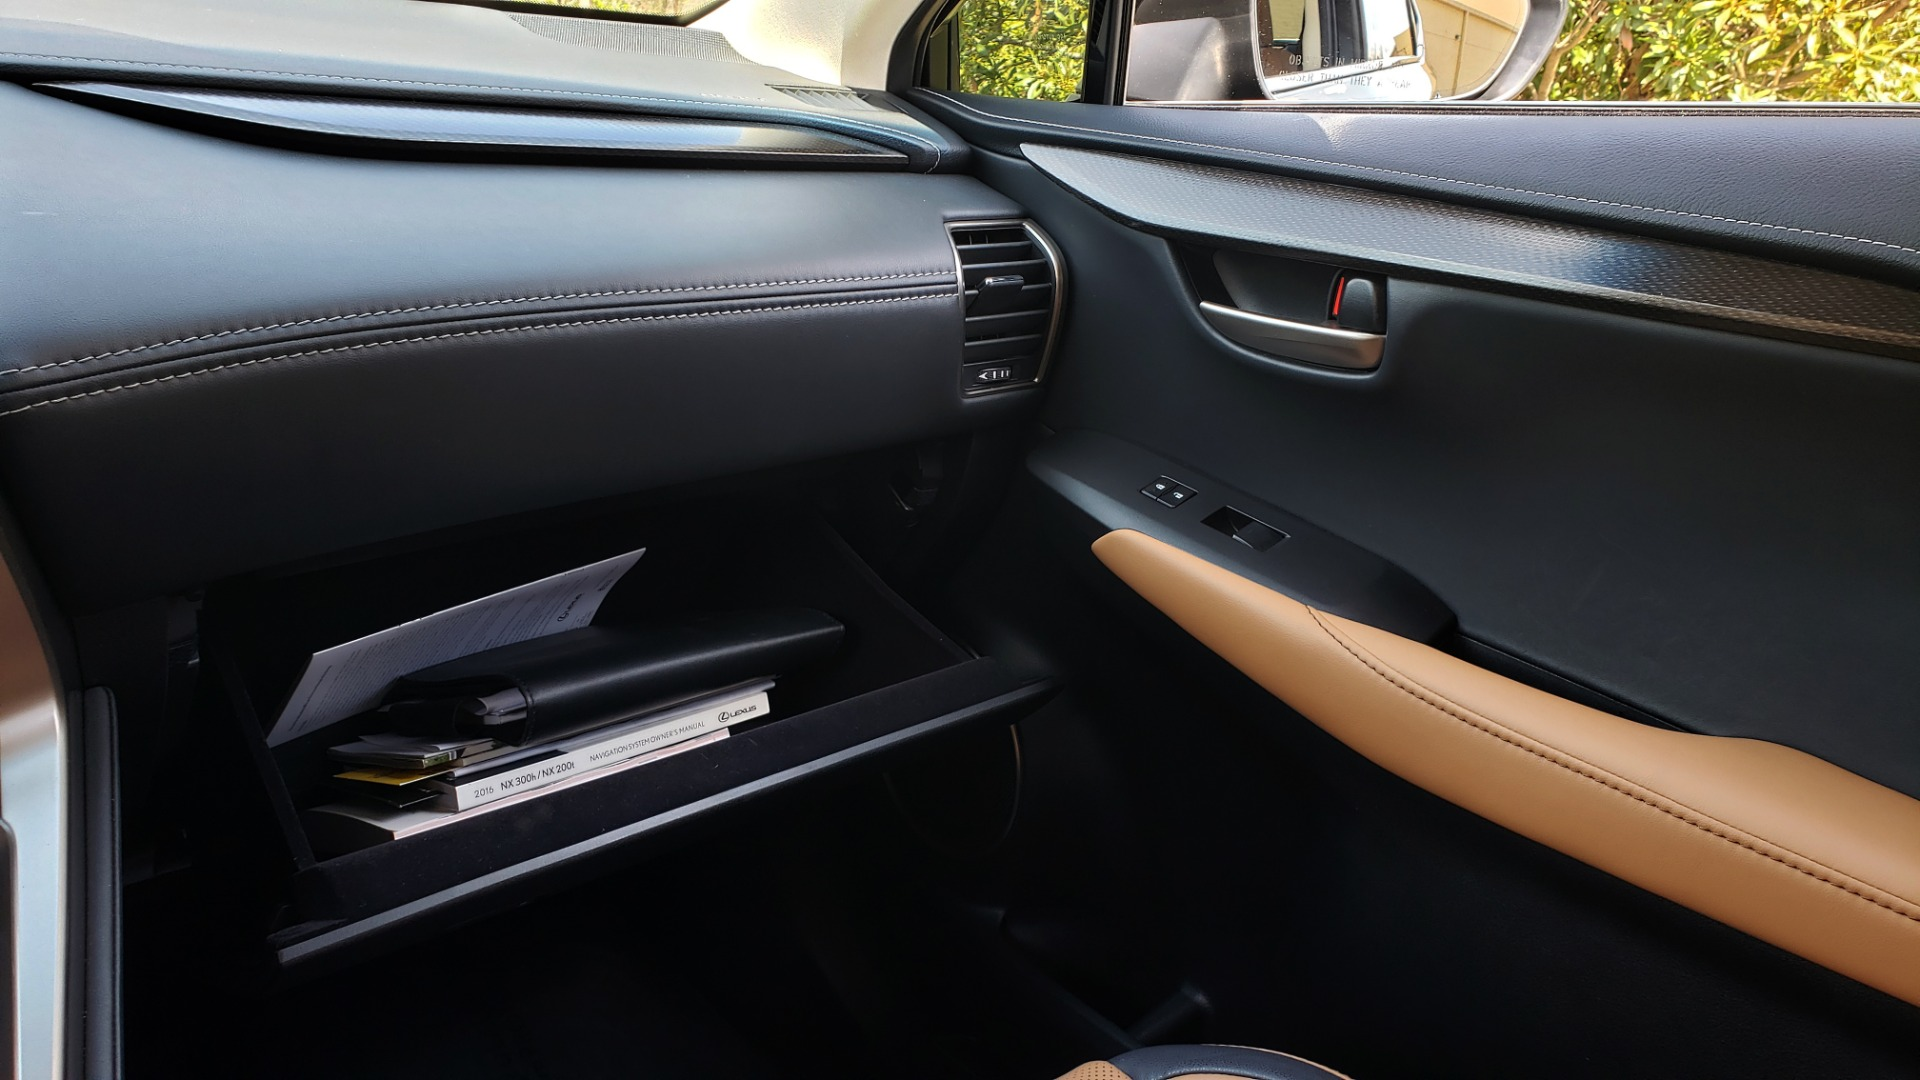 Used 2016 Lexus NX 200T PREM PKG / NAV / SUNROOF / PRE-COLLISION / PARK ASST for sale Sold at Formula Imports in Charlotte NC 28227 49